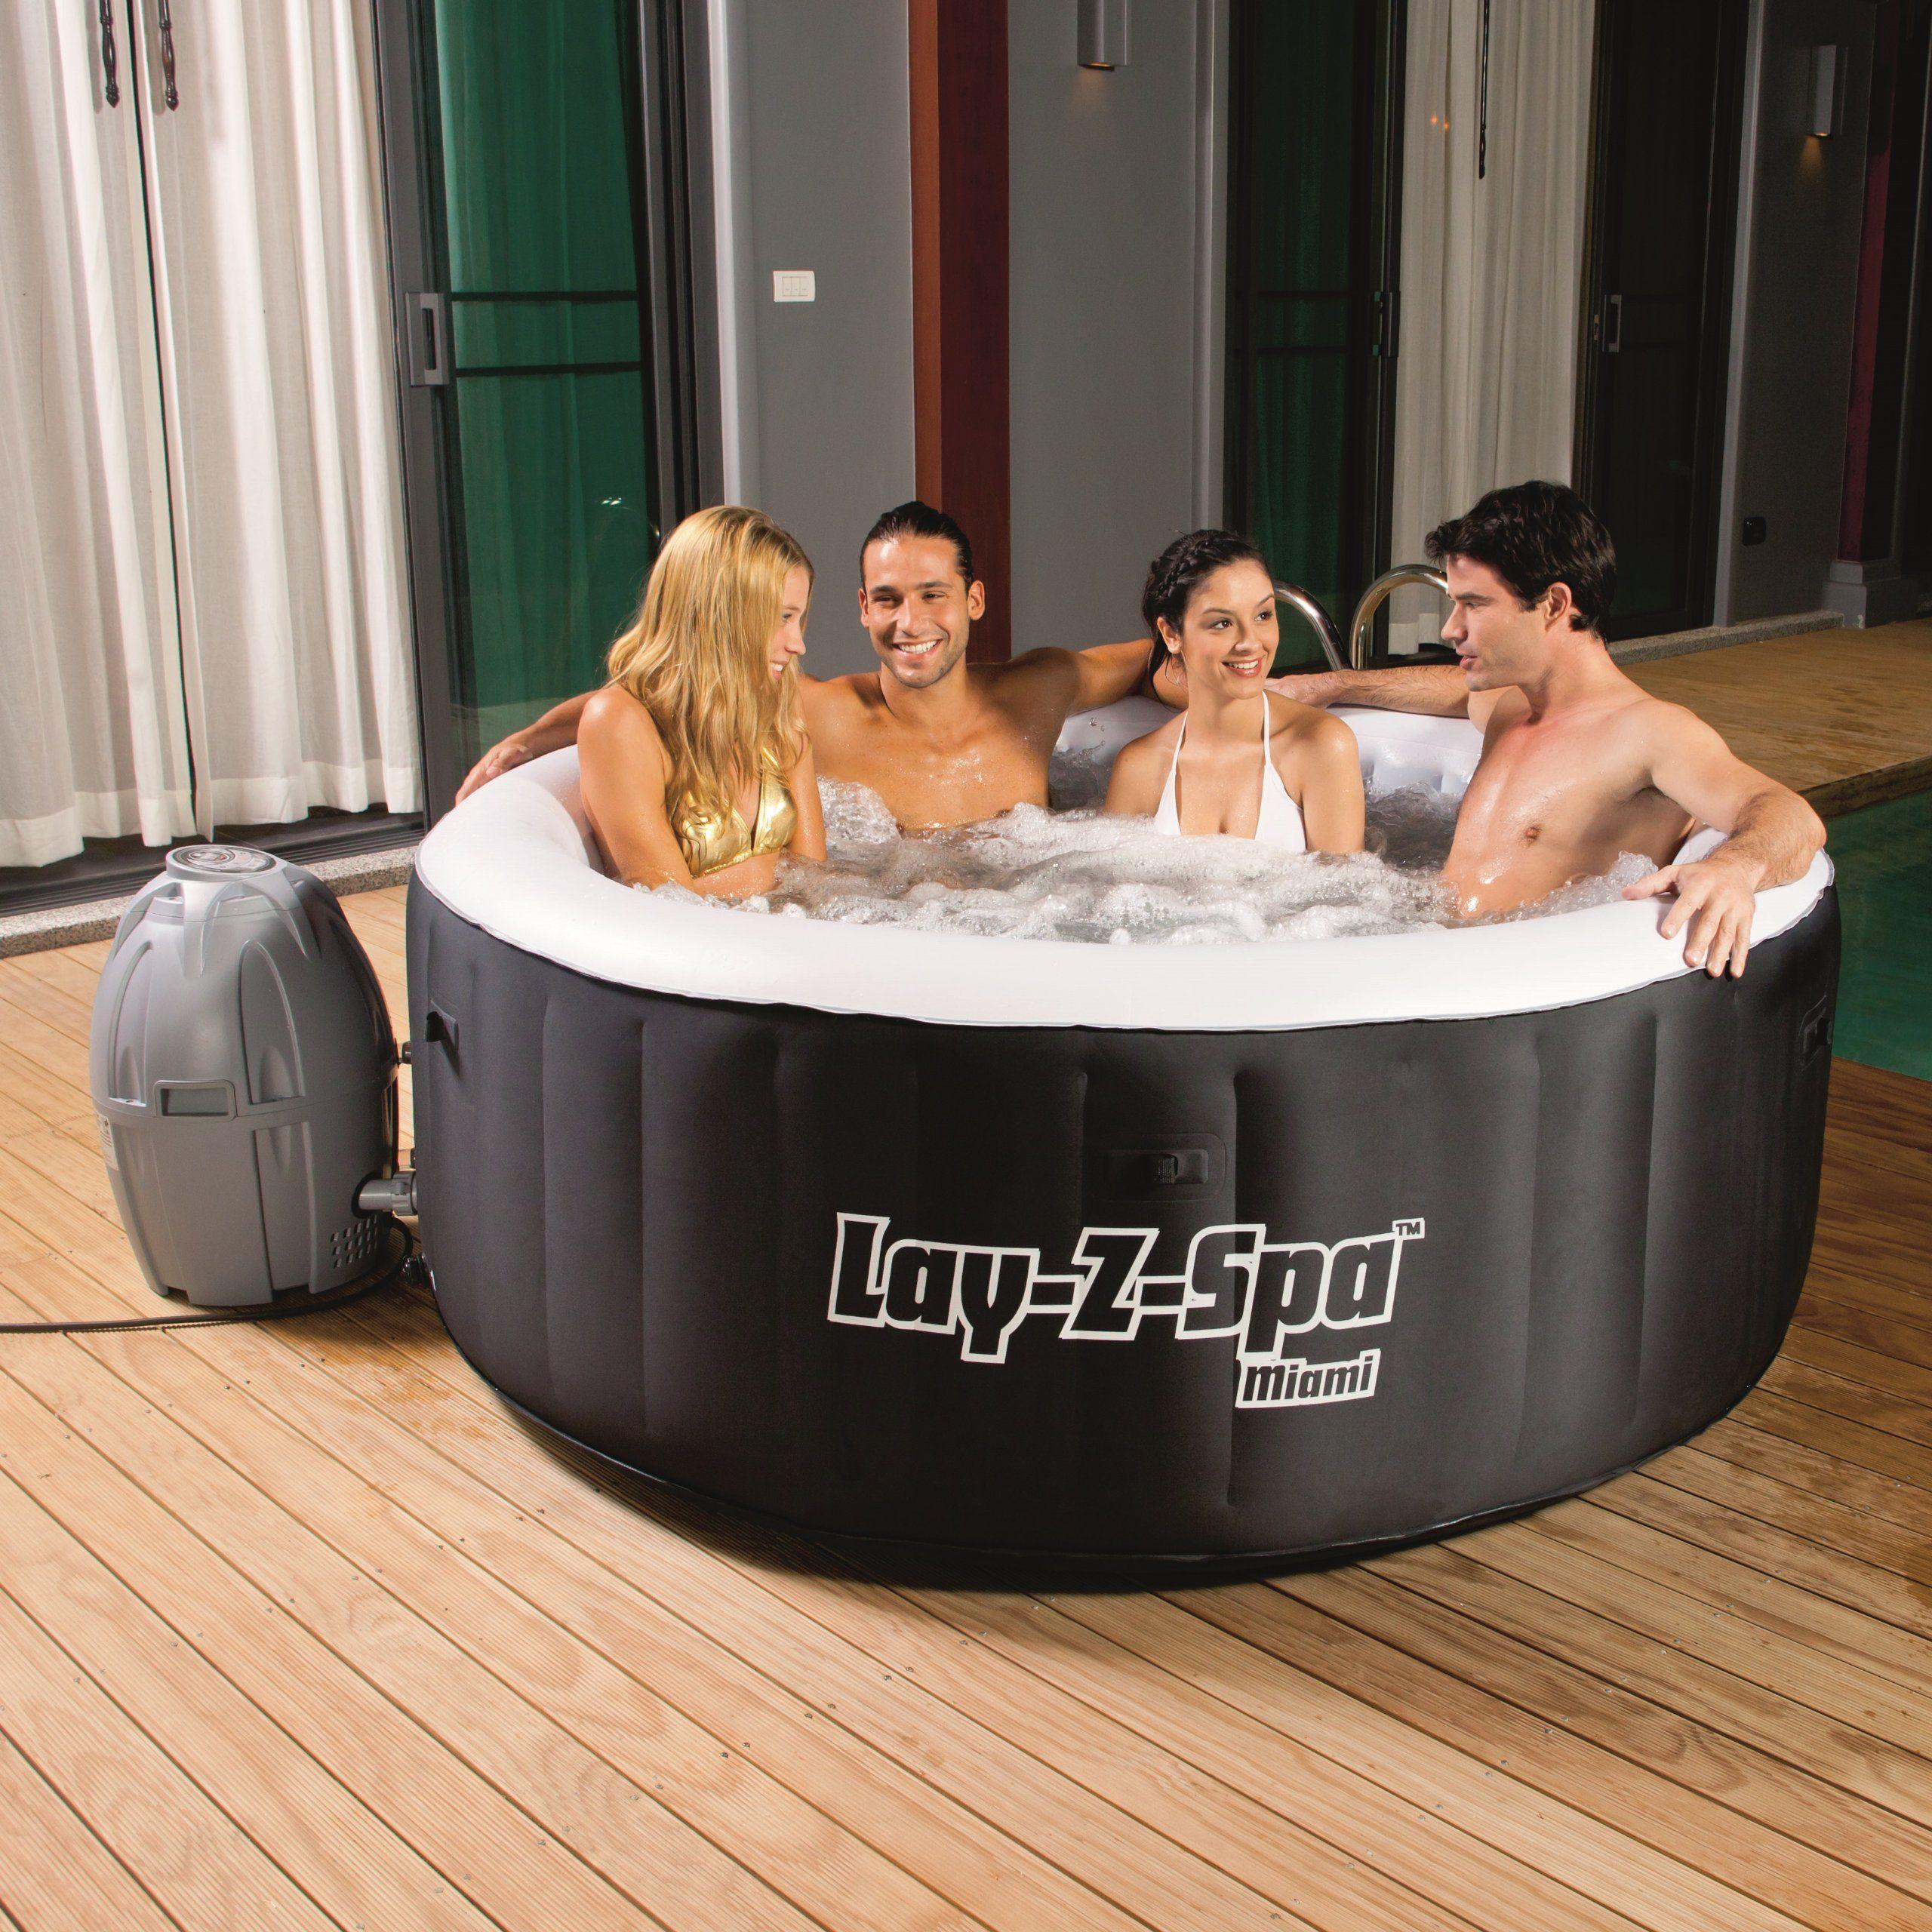 person airjet tubs spa inflatable tub amazon saluspa hot max ip com portable realtree walmart